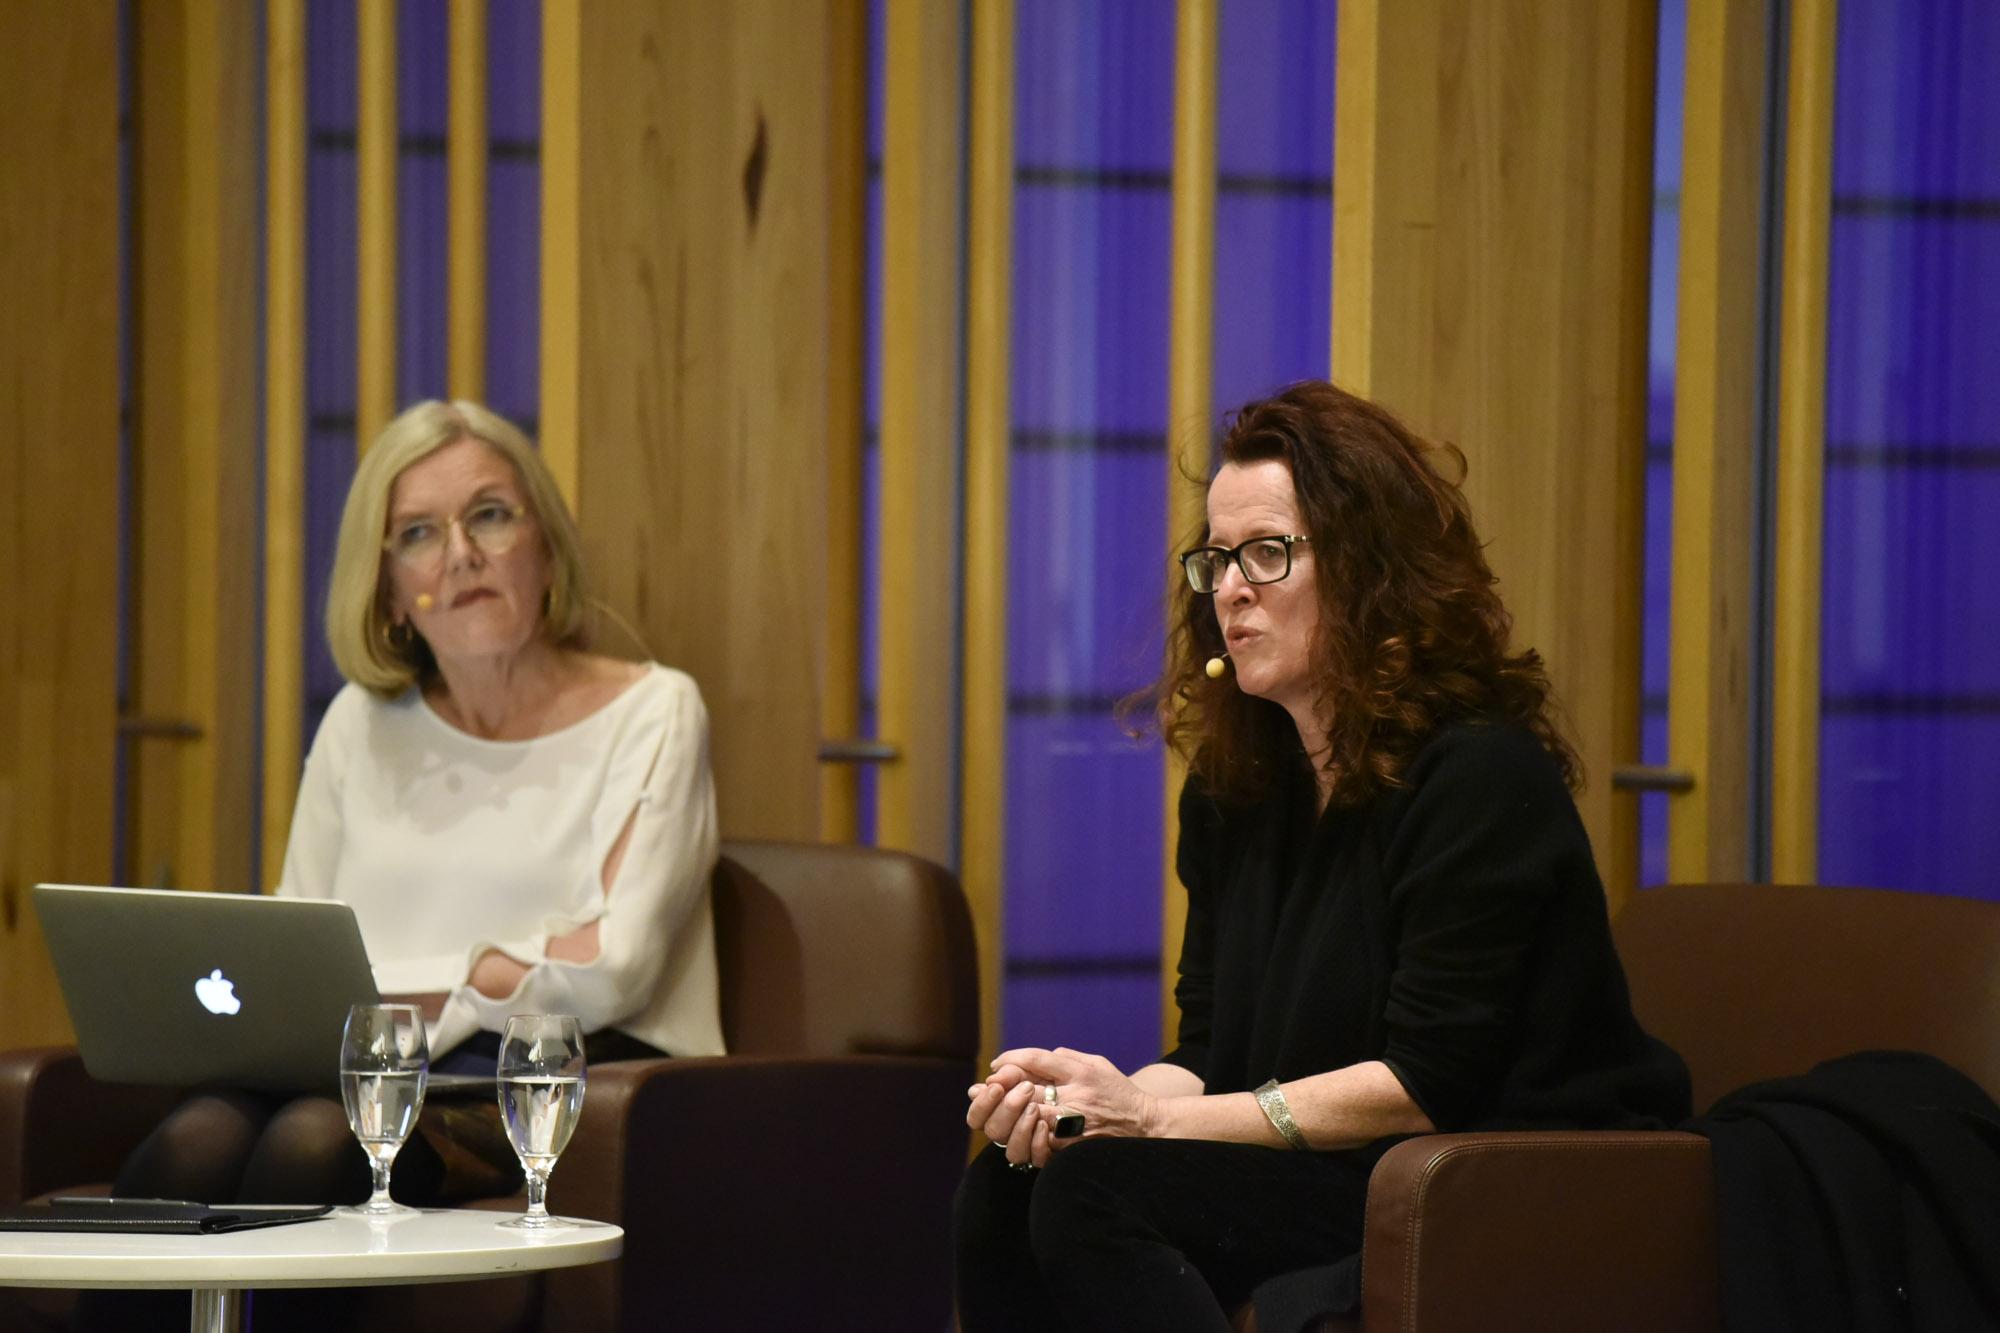 Jenny Brockie interviewing Professor Genevieve Bell